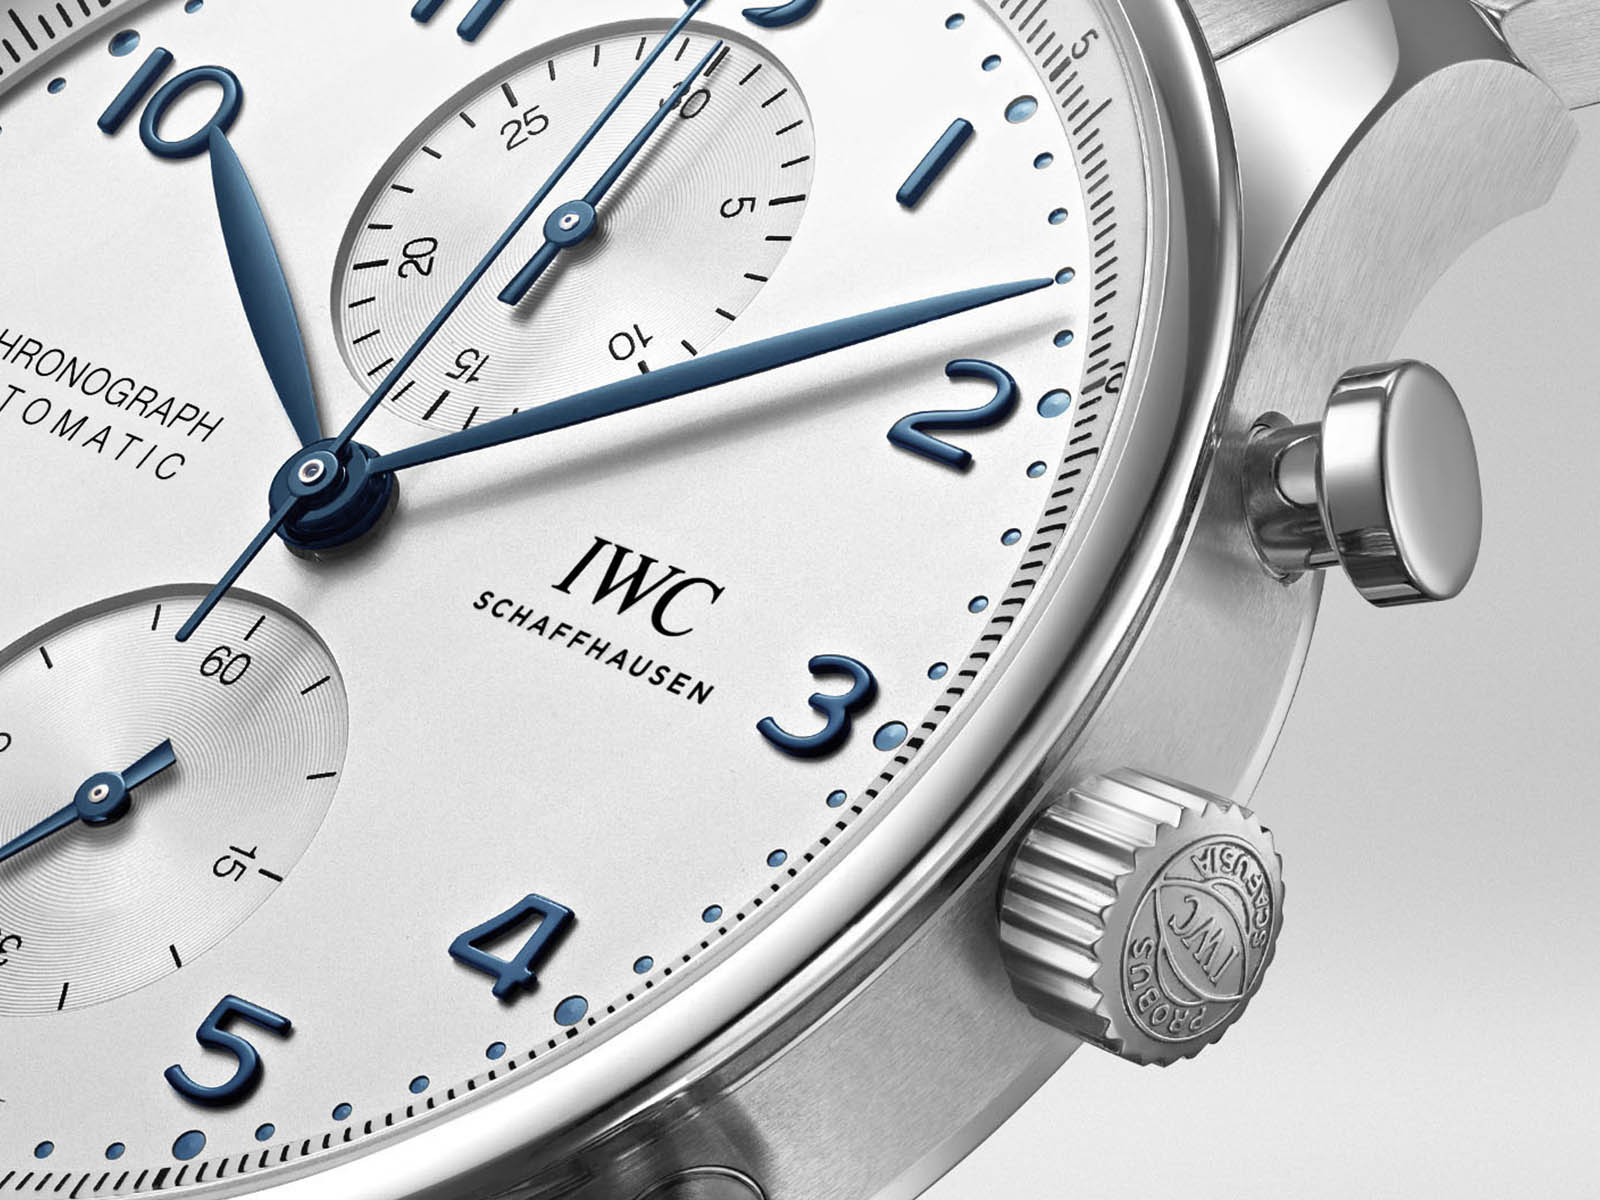 iw371617-iwc-portugieser-chronograph-stainless-steel-bracelet-5.jpg